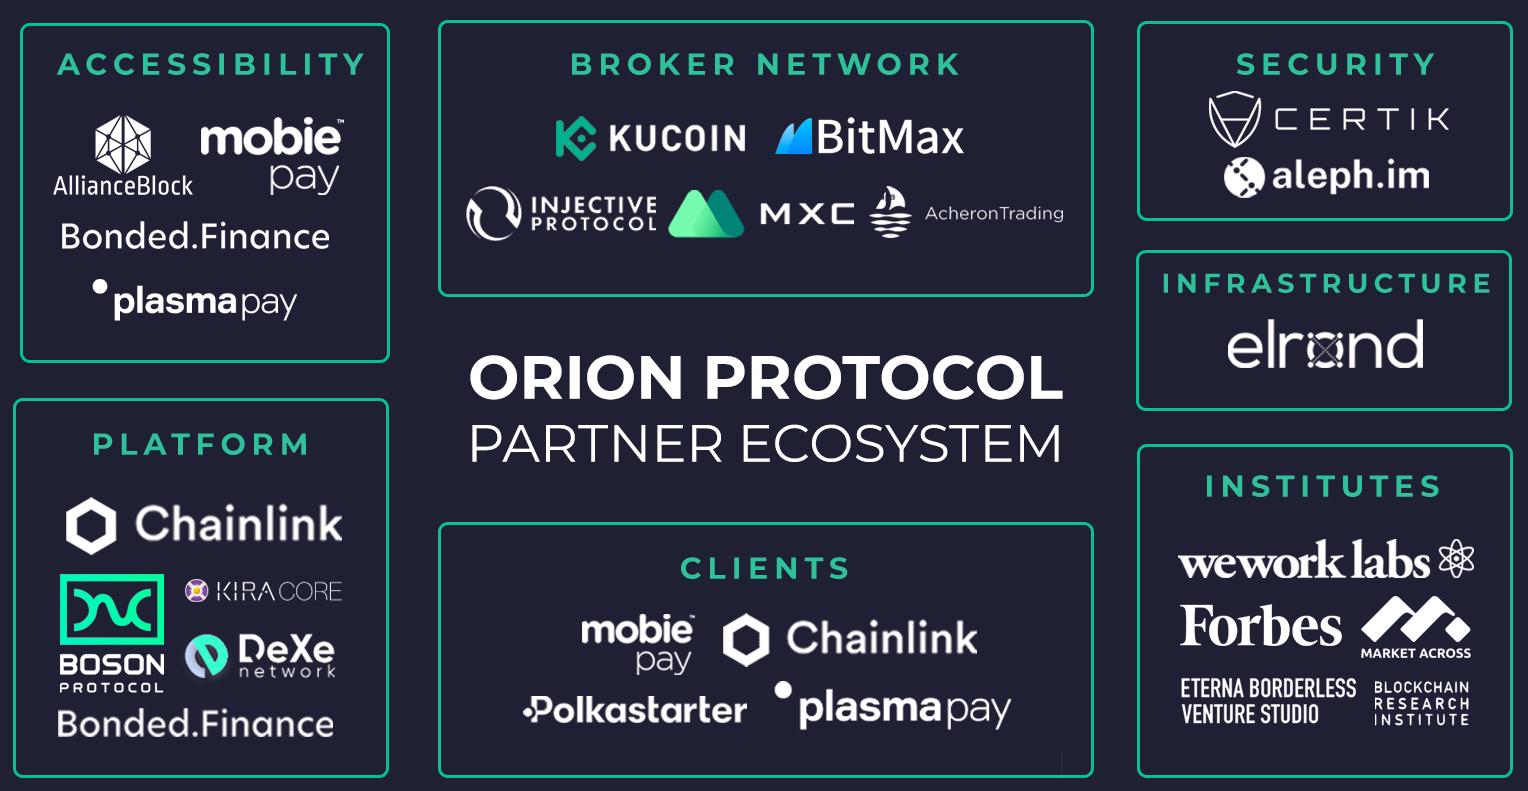 partnerships blog-1